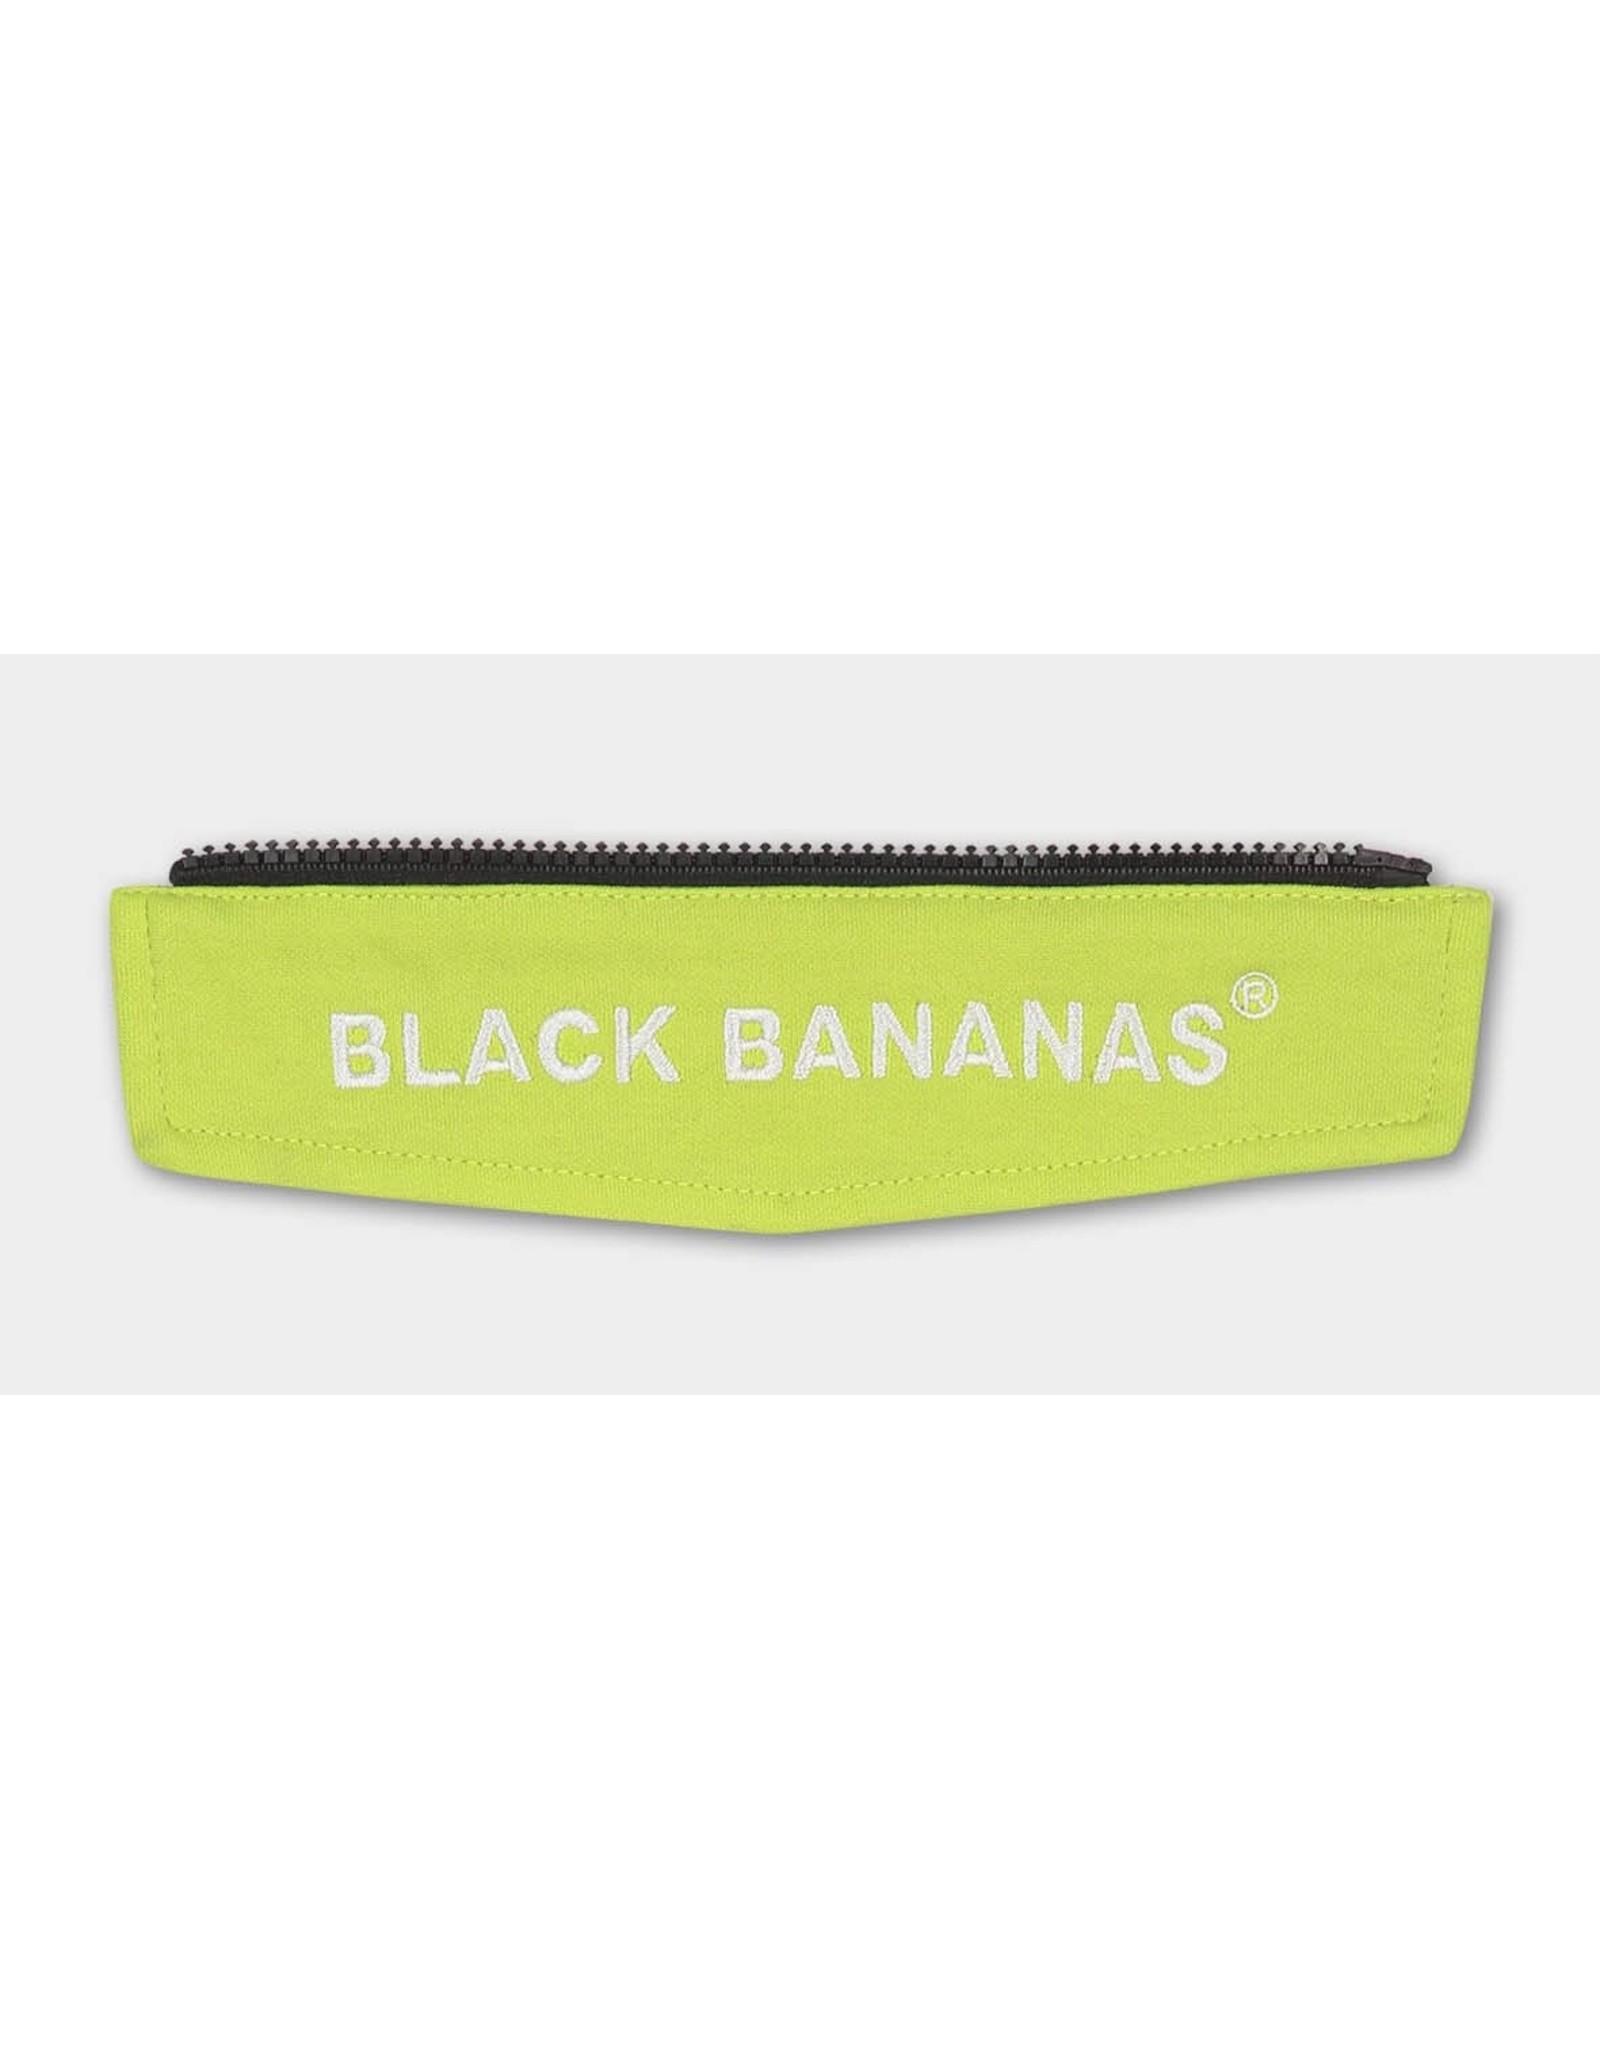 Black Bananas JRFW21/020 Switch Hoody